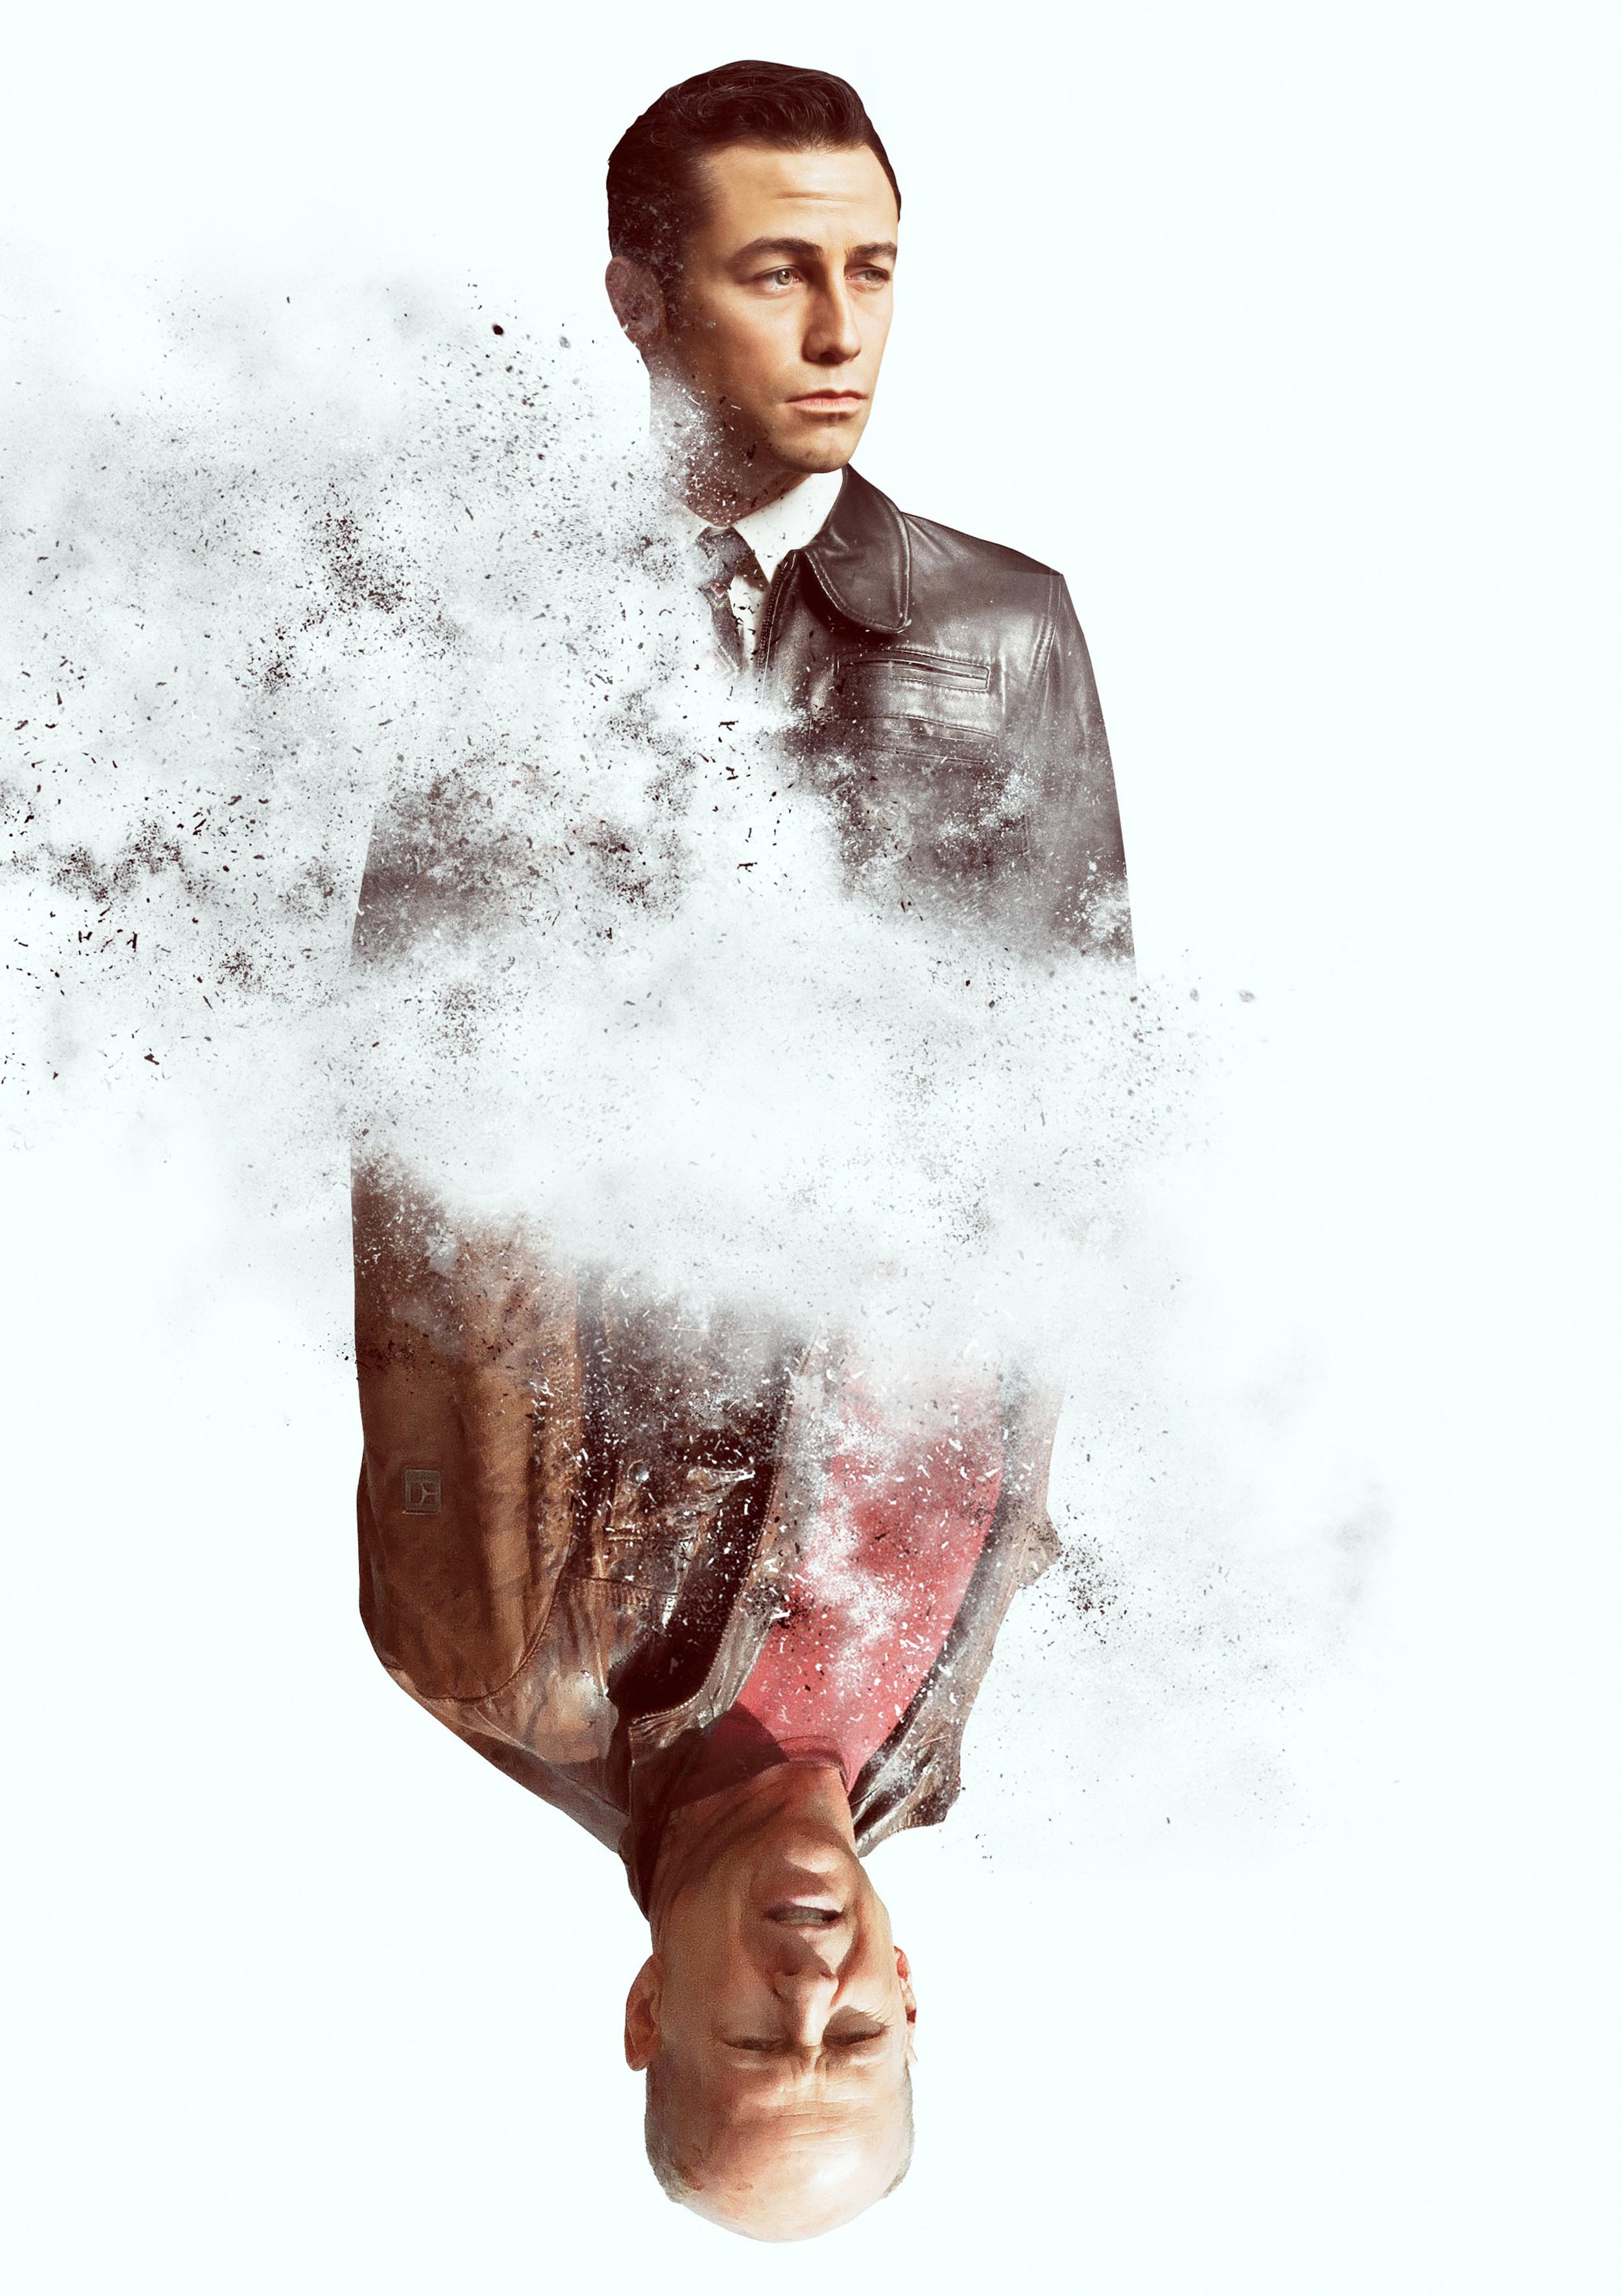 Looper (2012) - Rian Johnson